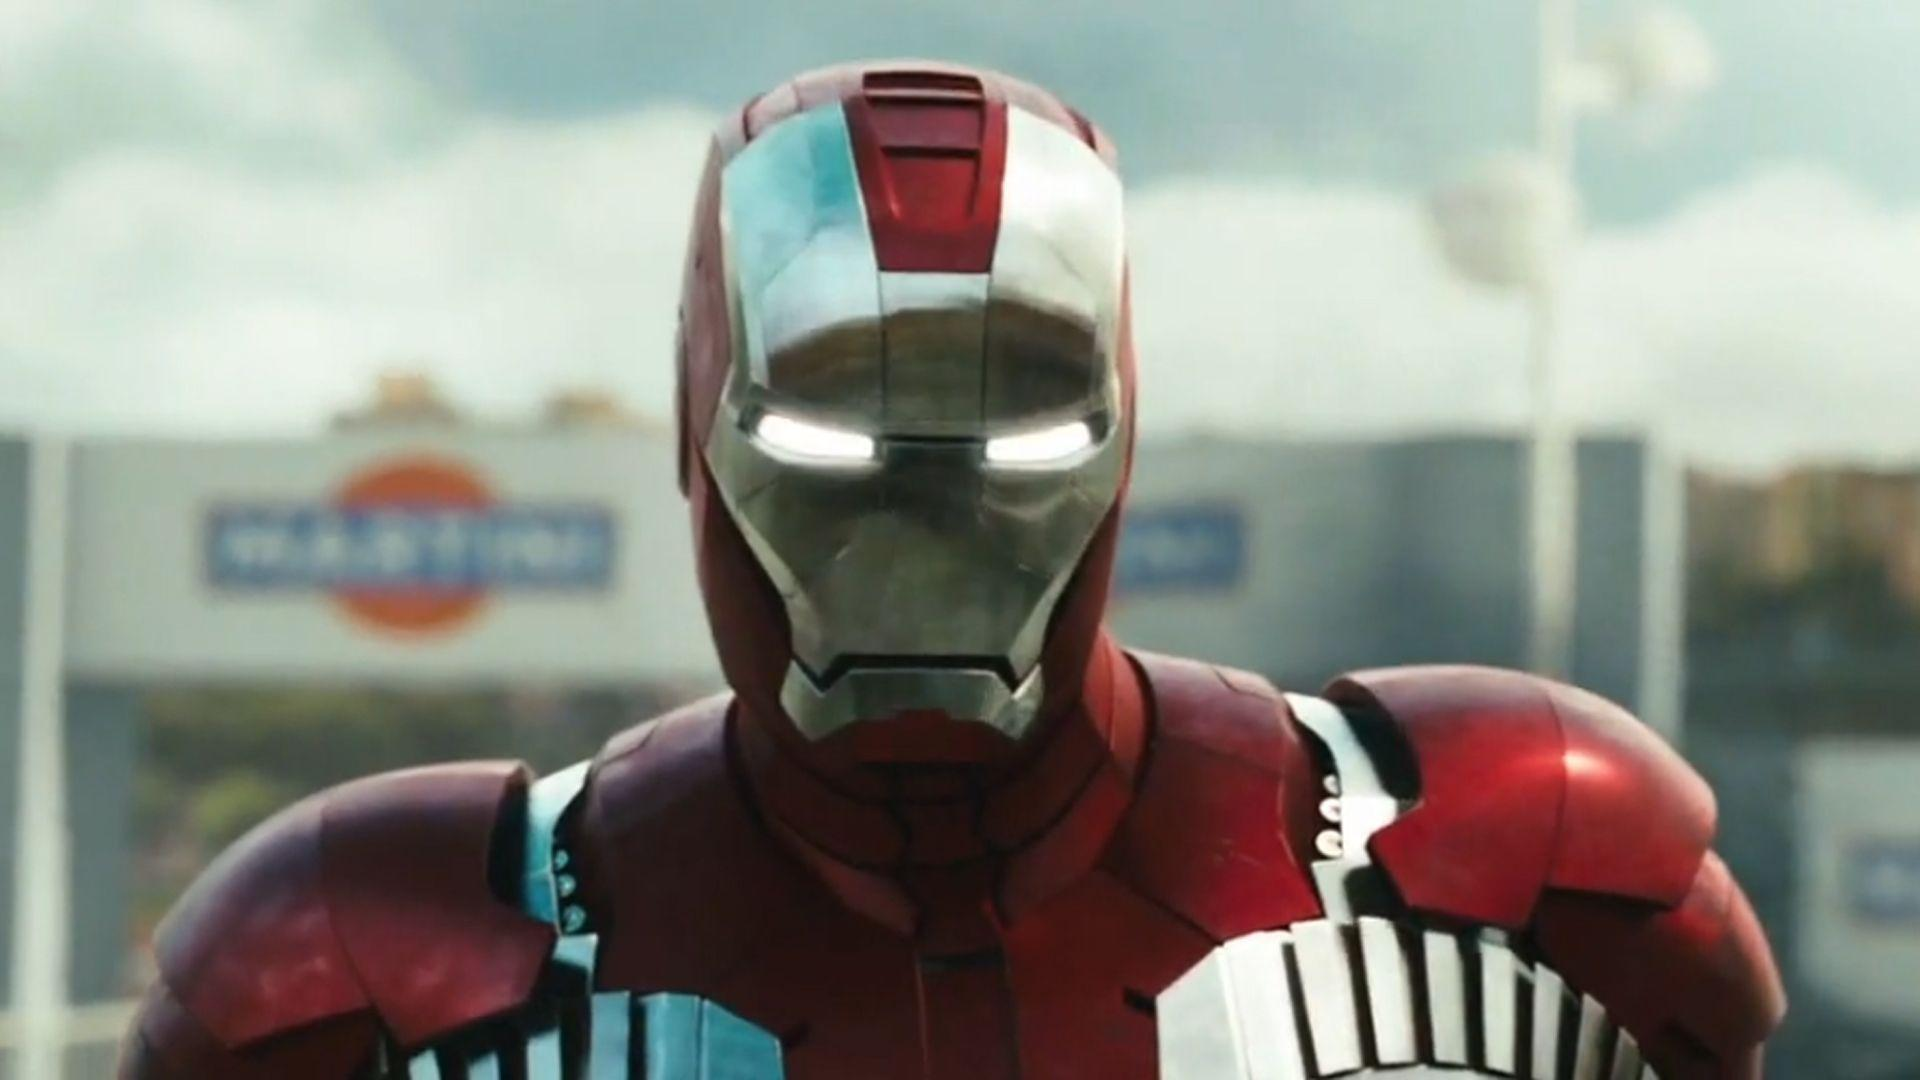 Iron Man 2 Wallpapers HD - Wallpaper Cave  Iron Man 2 Wall...